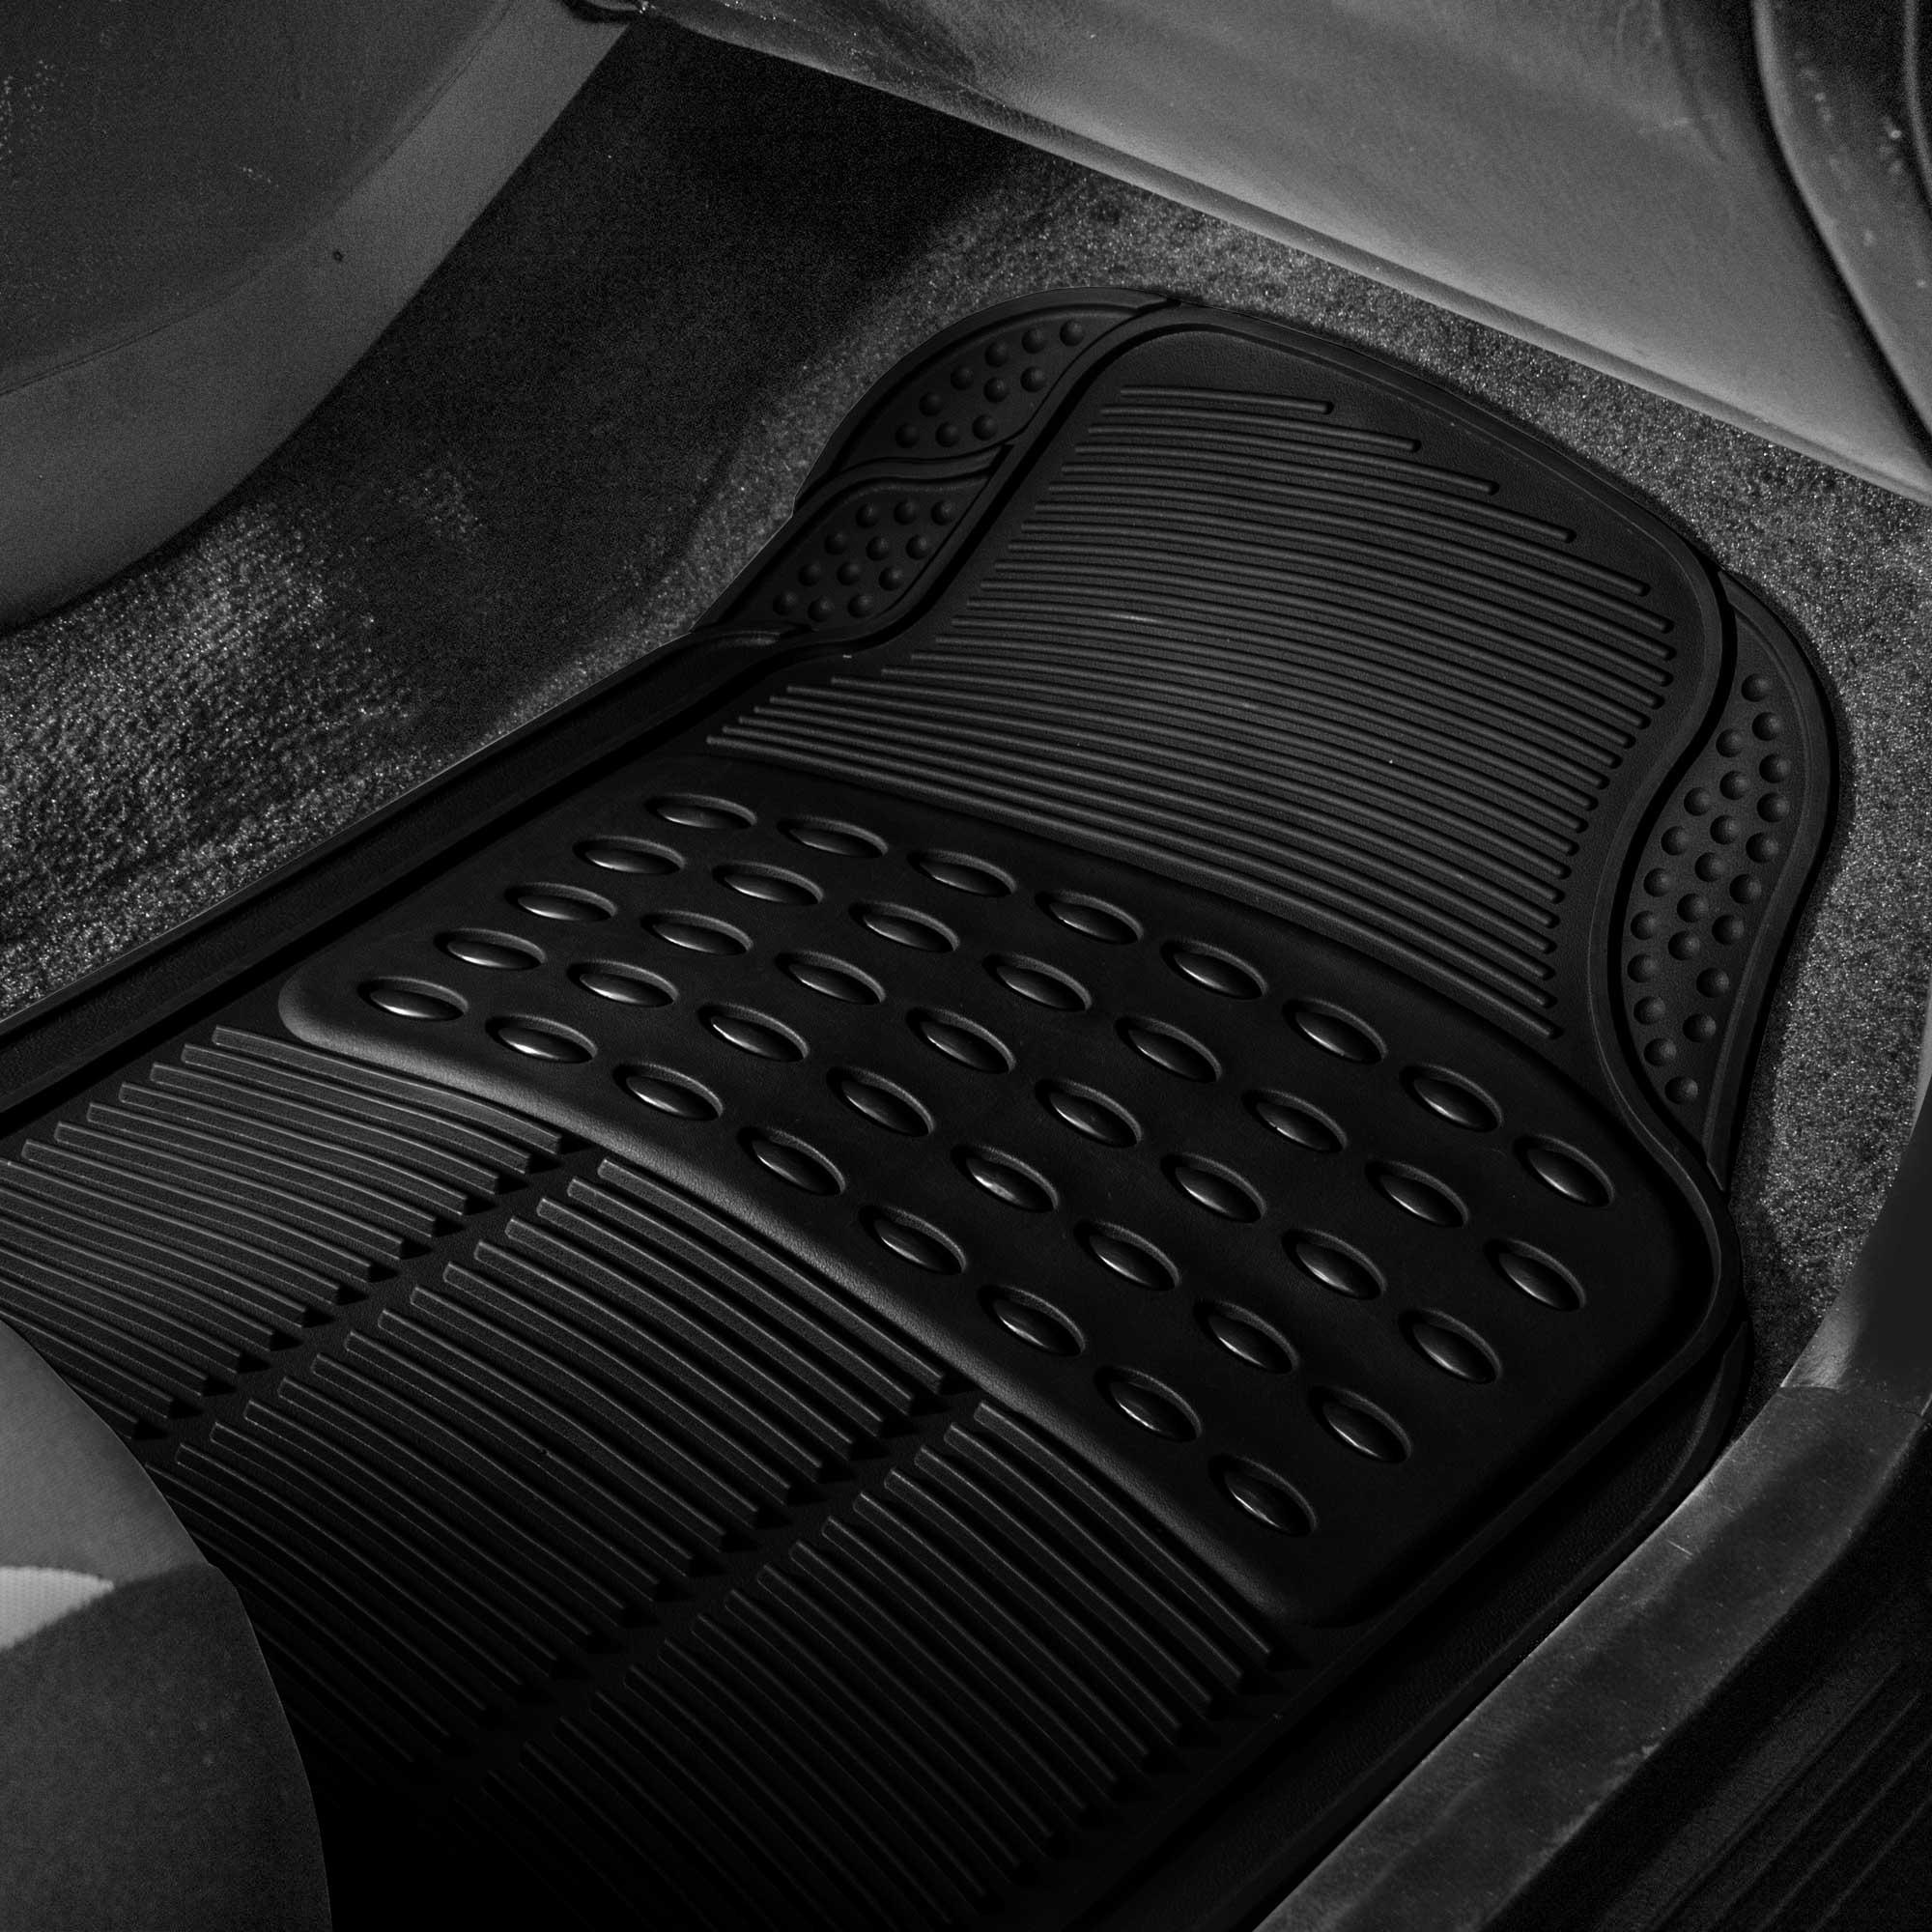 3pc-Floor-Mats-for-Auto-Car-SUV-Van-Heavy-Duty-3-Colors-w-Free-Gift thumbnail 13